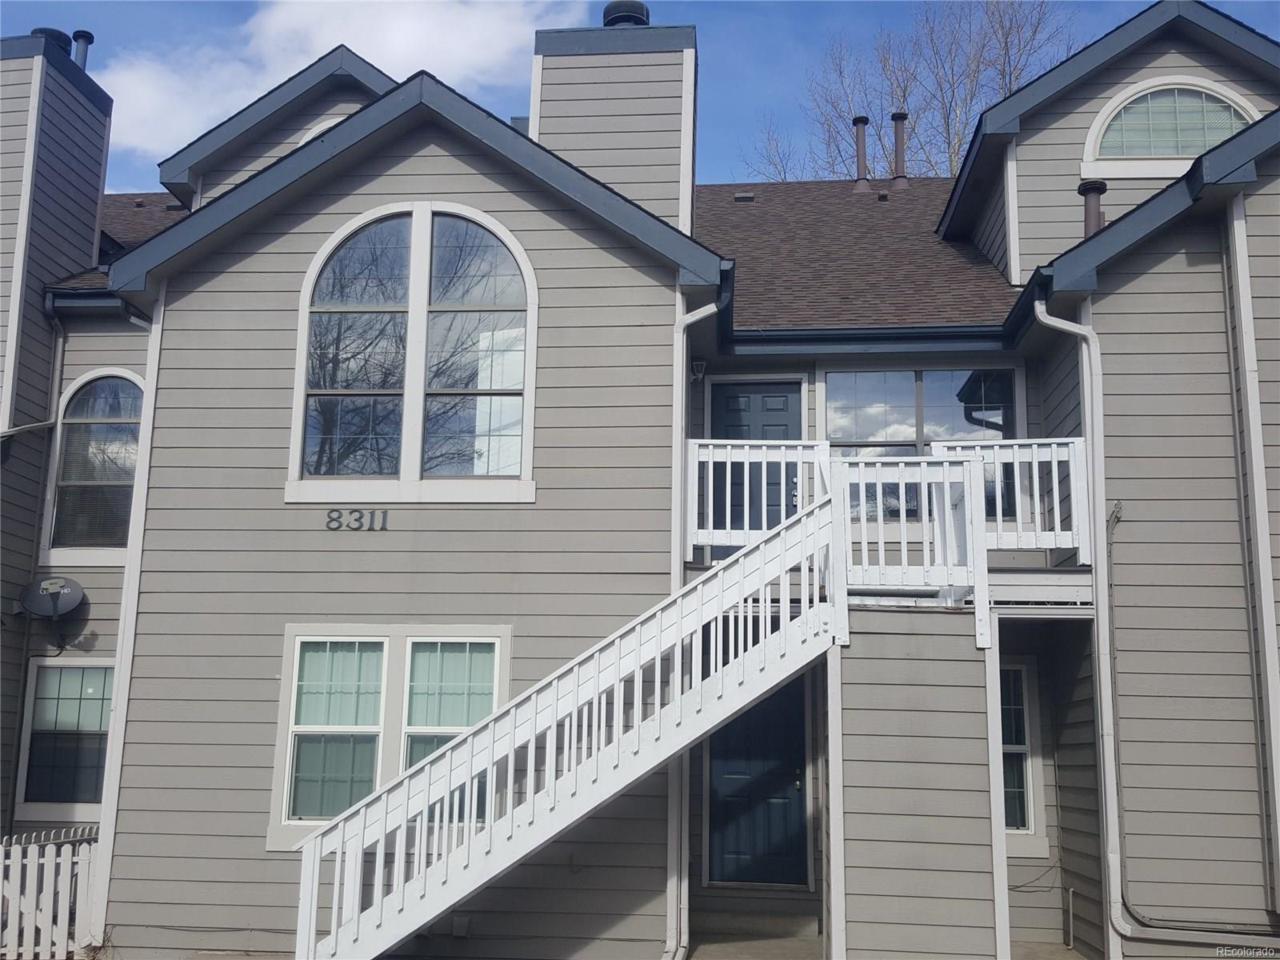 8311 S Upham Way 1-208, Littleton, CO 80128 (MLS #6587323) :: 8z Real Estate